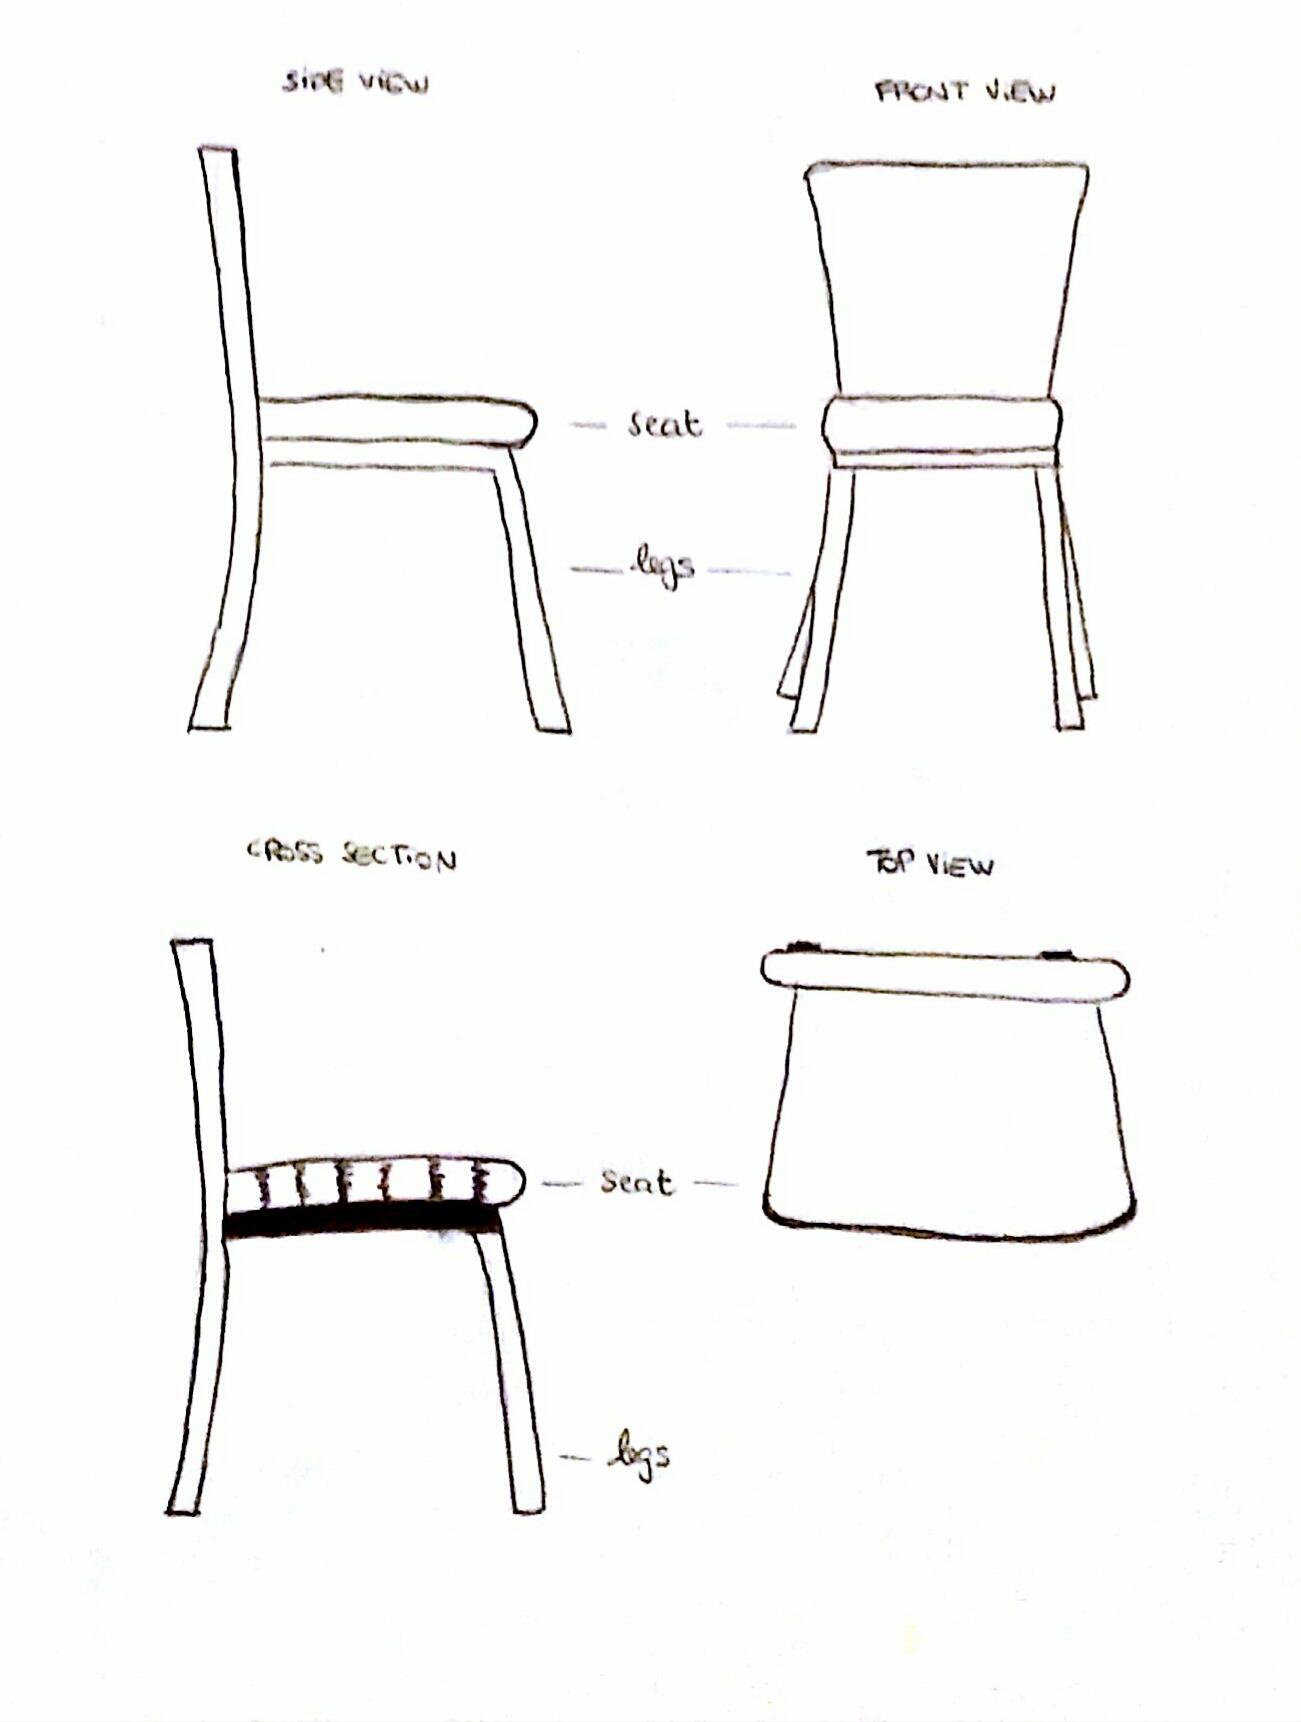 Ab Design Project